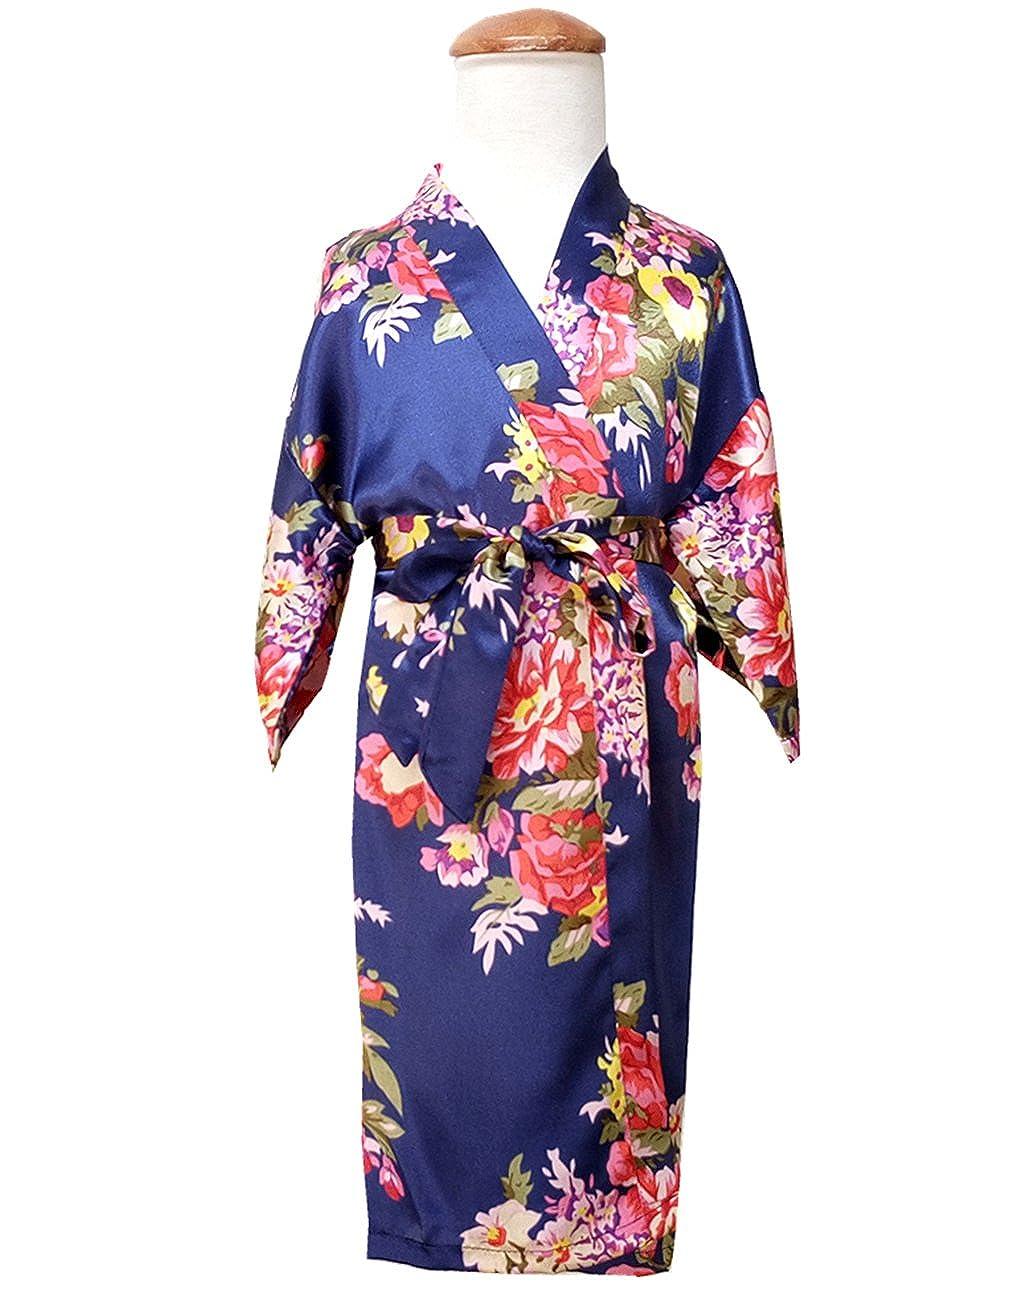 Opkelana Girls Lovely Satin Kimono Robe Floral Print Bathrobe Nightwear